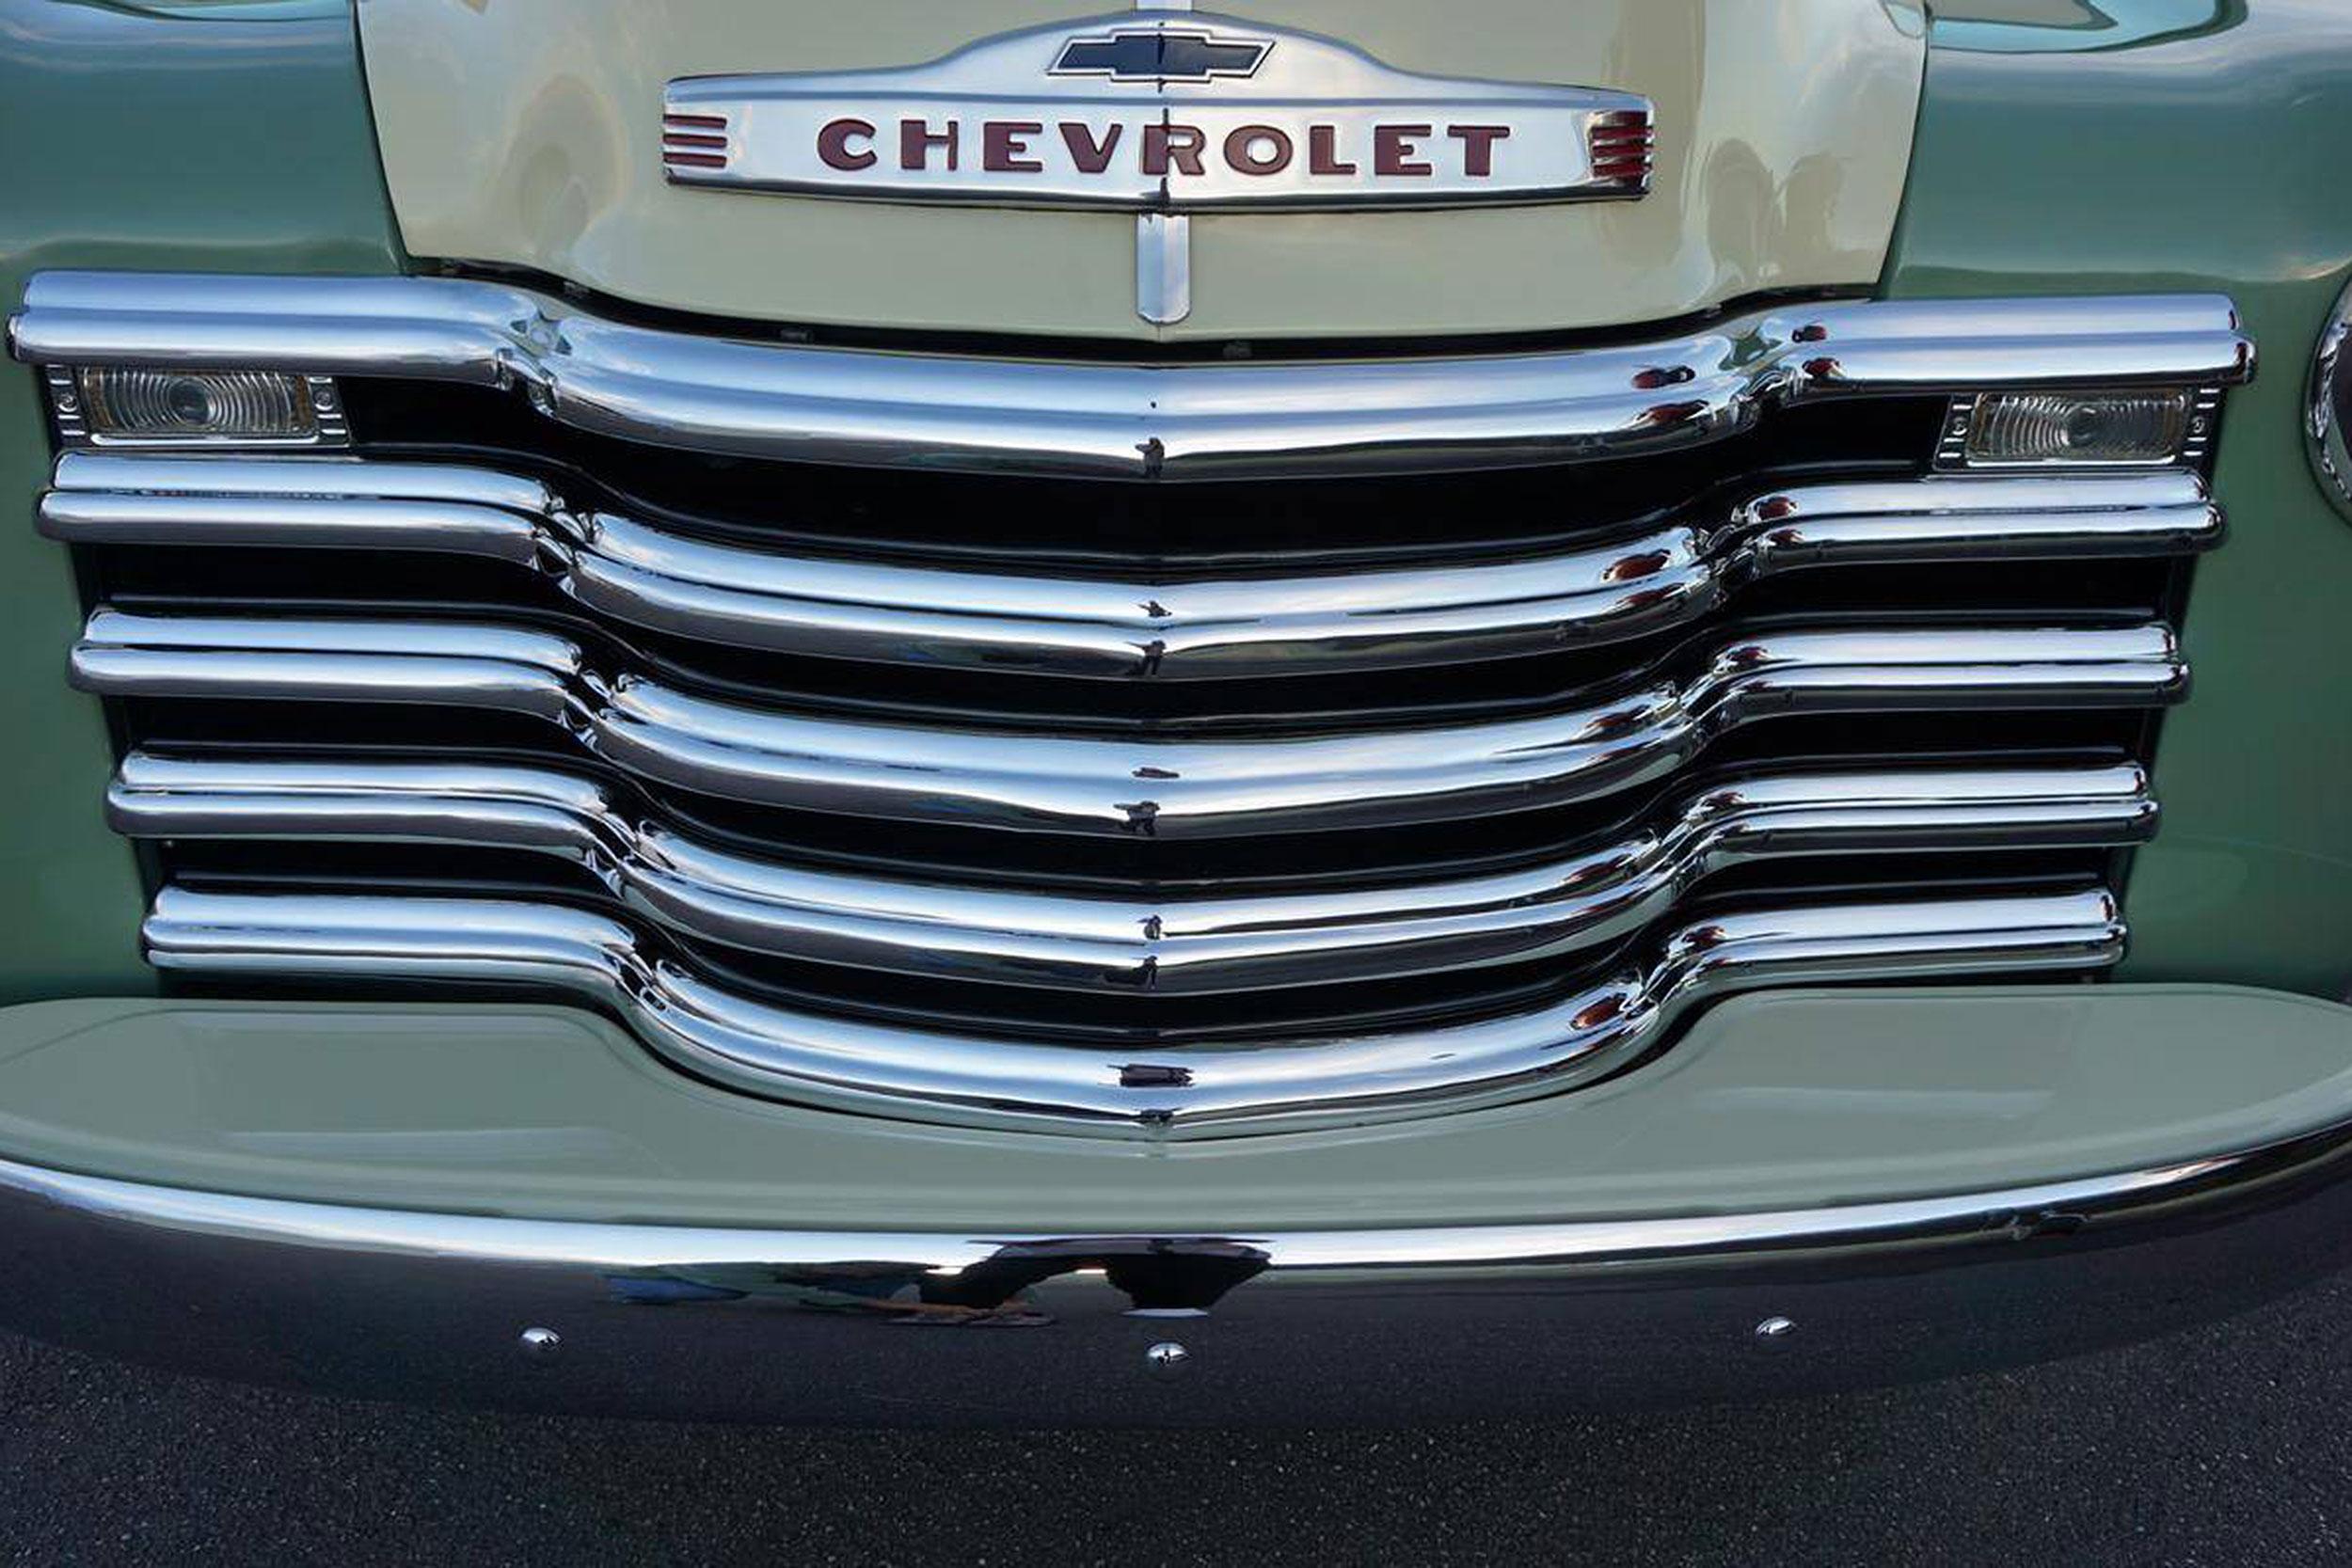 1952 Chevrolet Suburban Grille